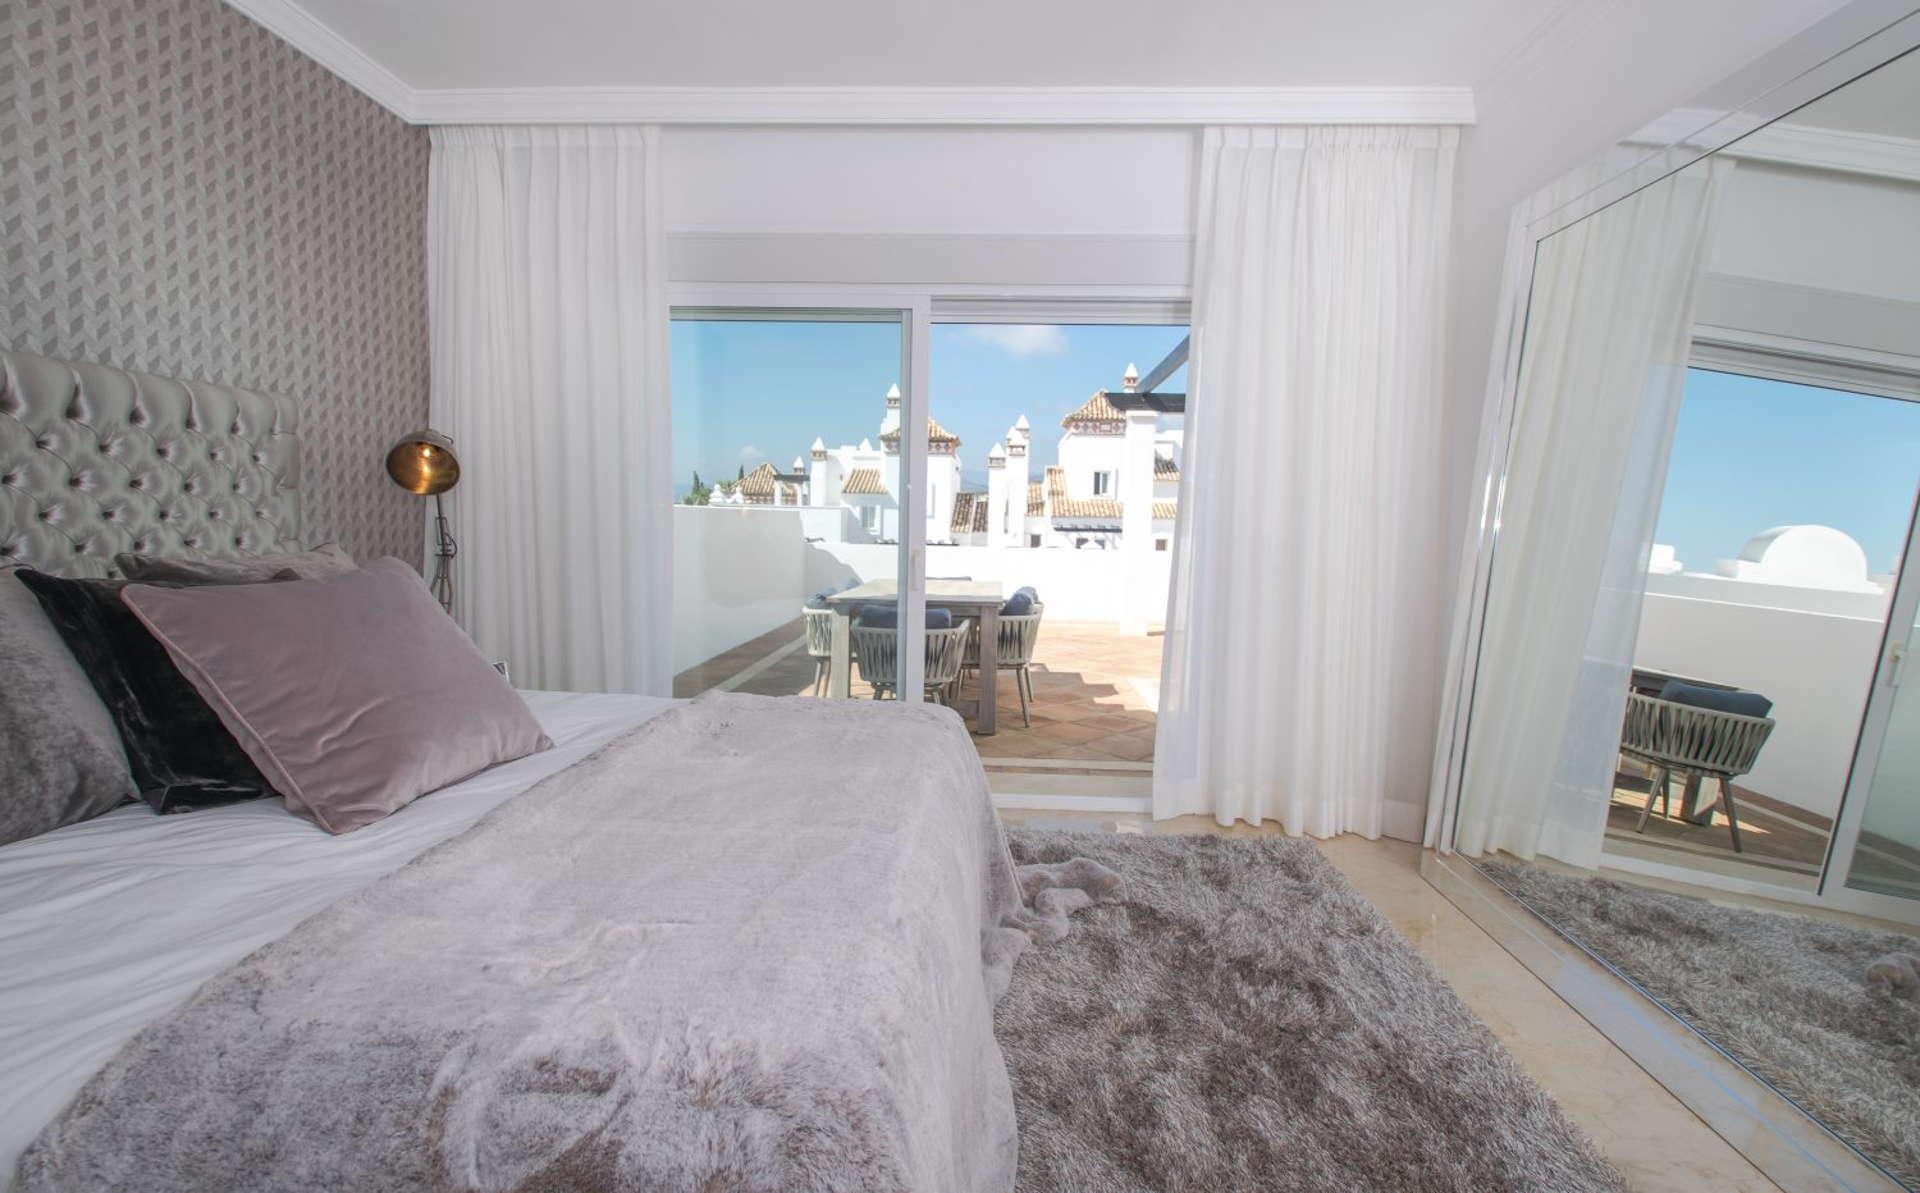 Columbus Hills 3 Bedroom Apartment In Sierra Blanca Marbella For Sale Realista